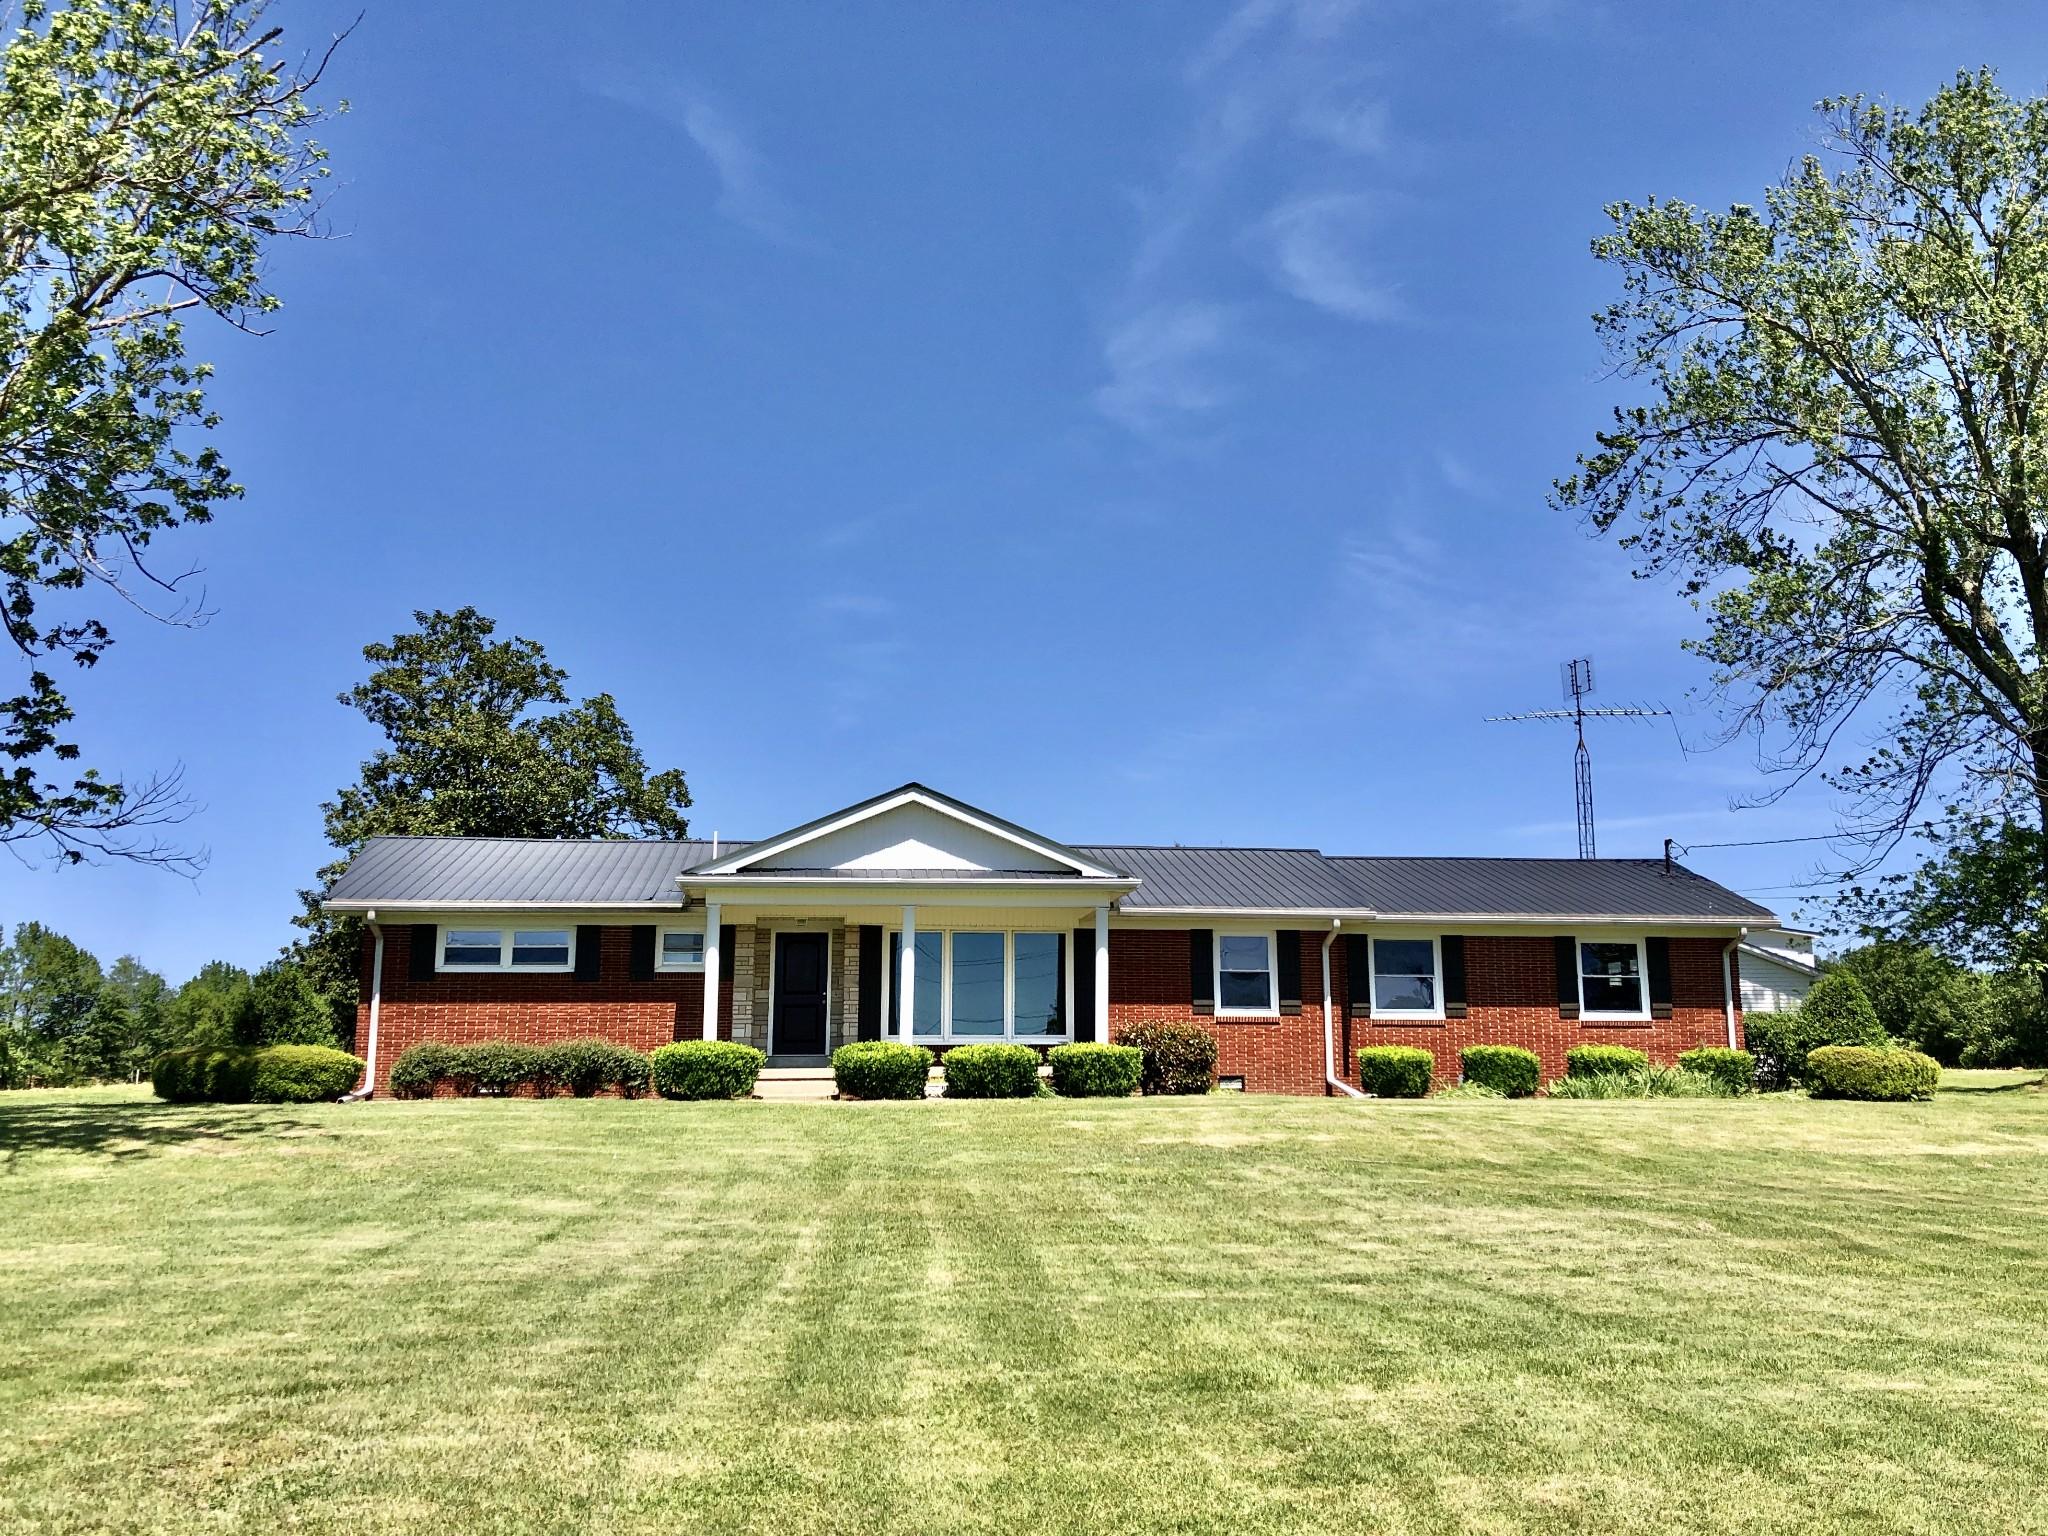 884 Prosser Rd, S, Leoma, TN 38468 - Leoma, TN real estate listing